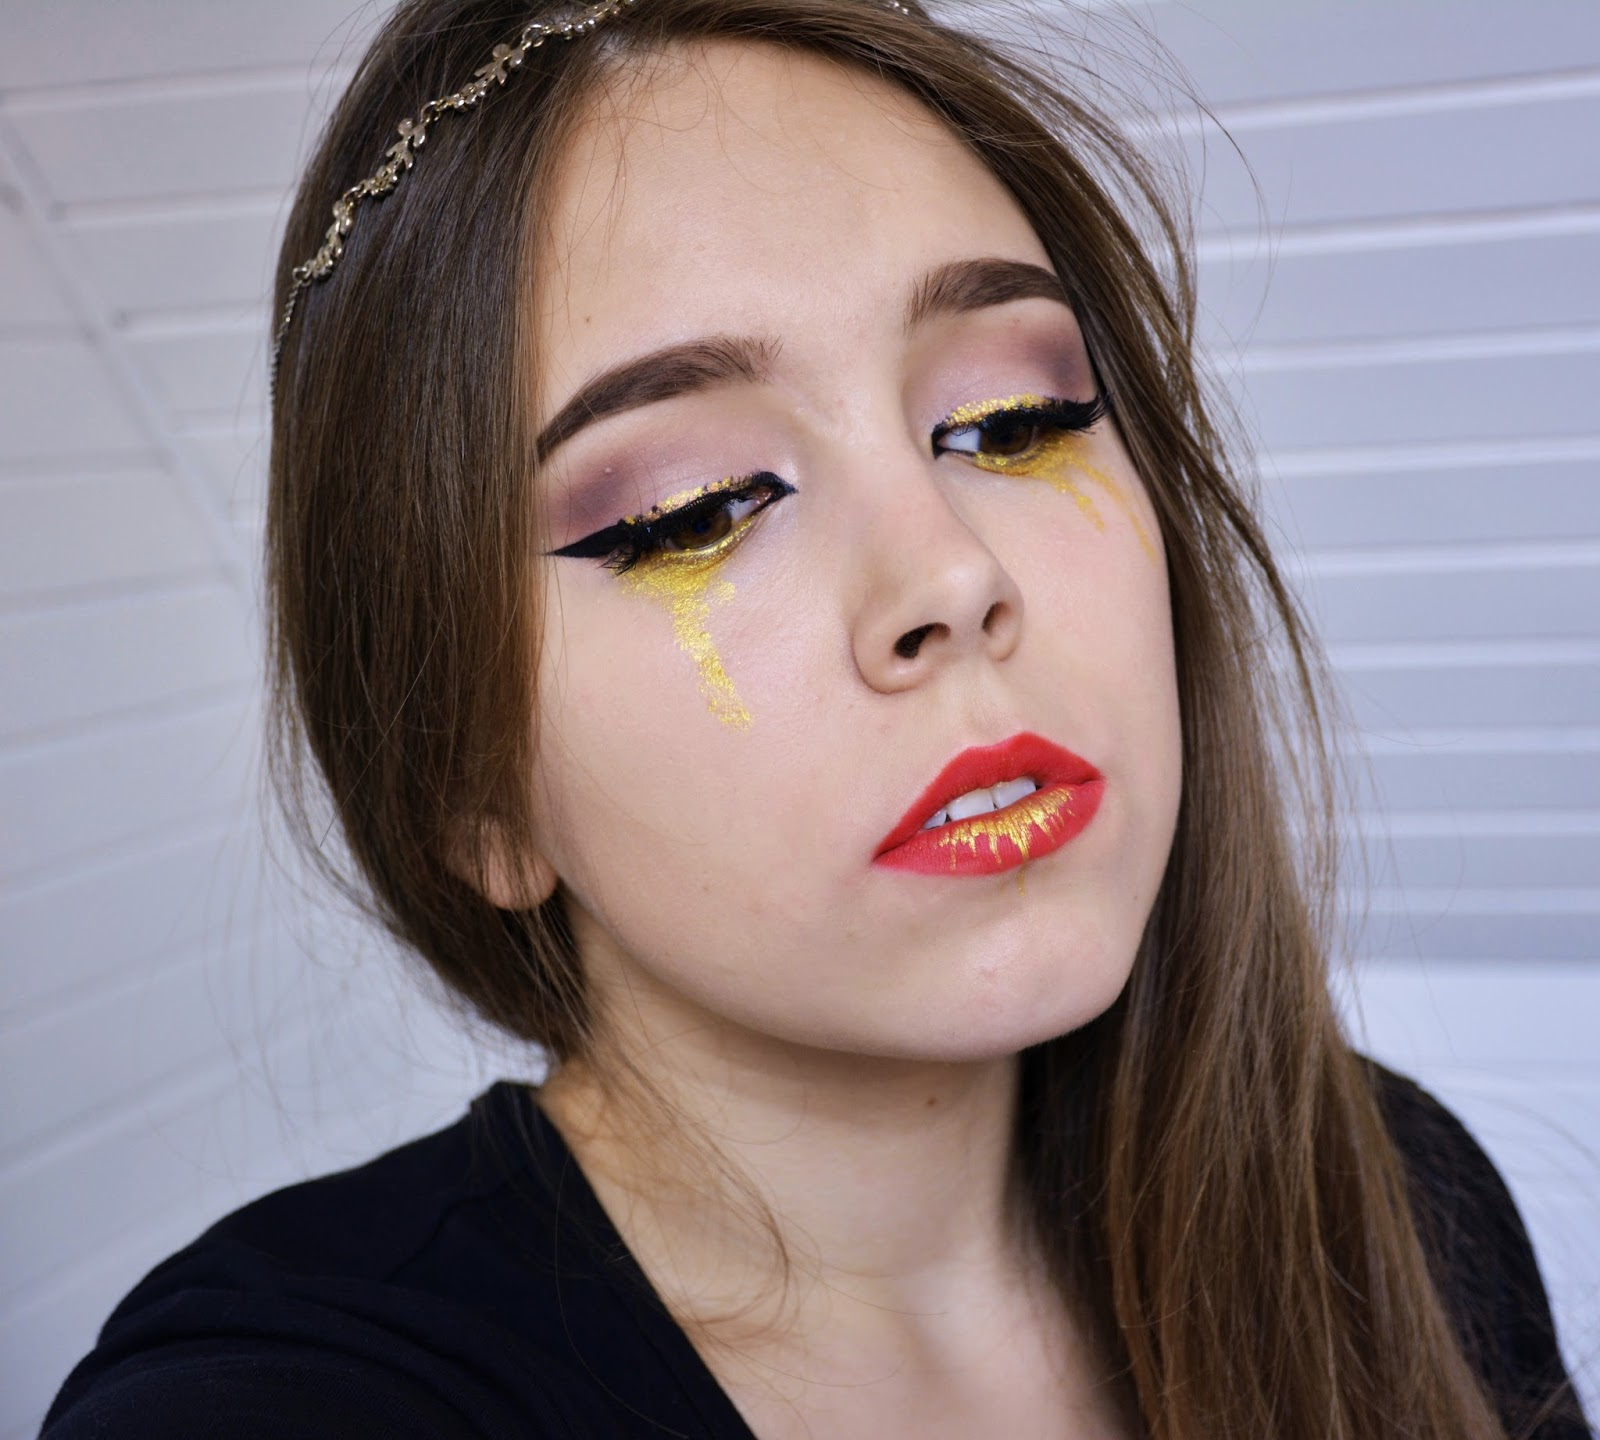 KOBO Professional Pigment Gold Dust  50, Duraline, Maybelline Gel Eyeliner, MAC Russian Red, Golden Tears, Artystyczny Makijaż, Artistic Make-up